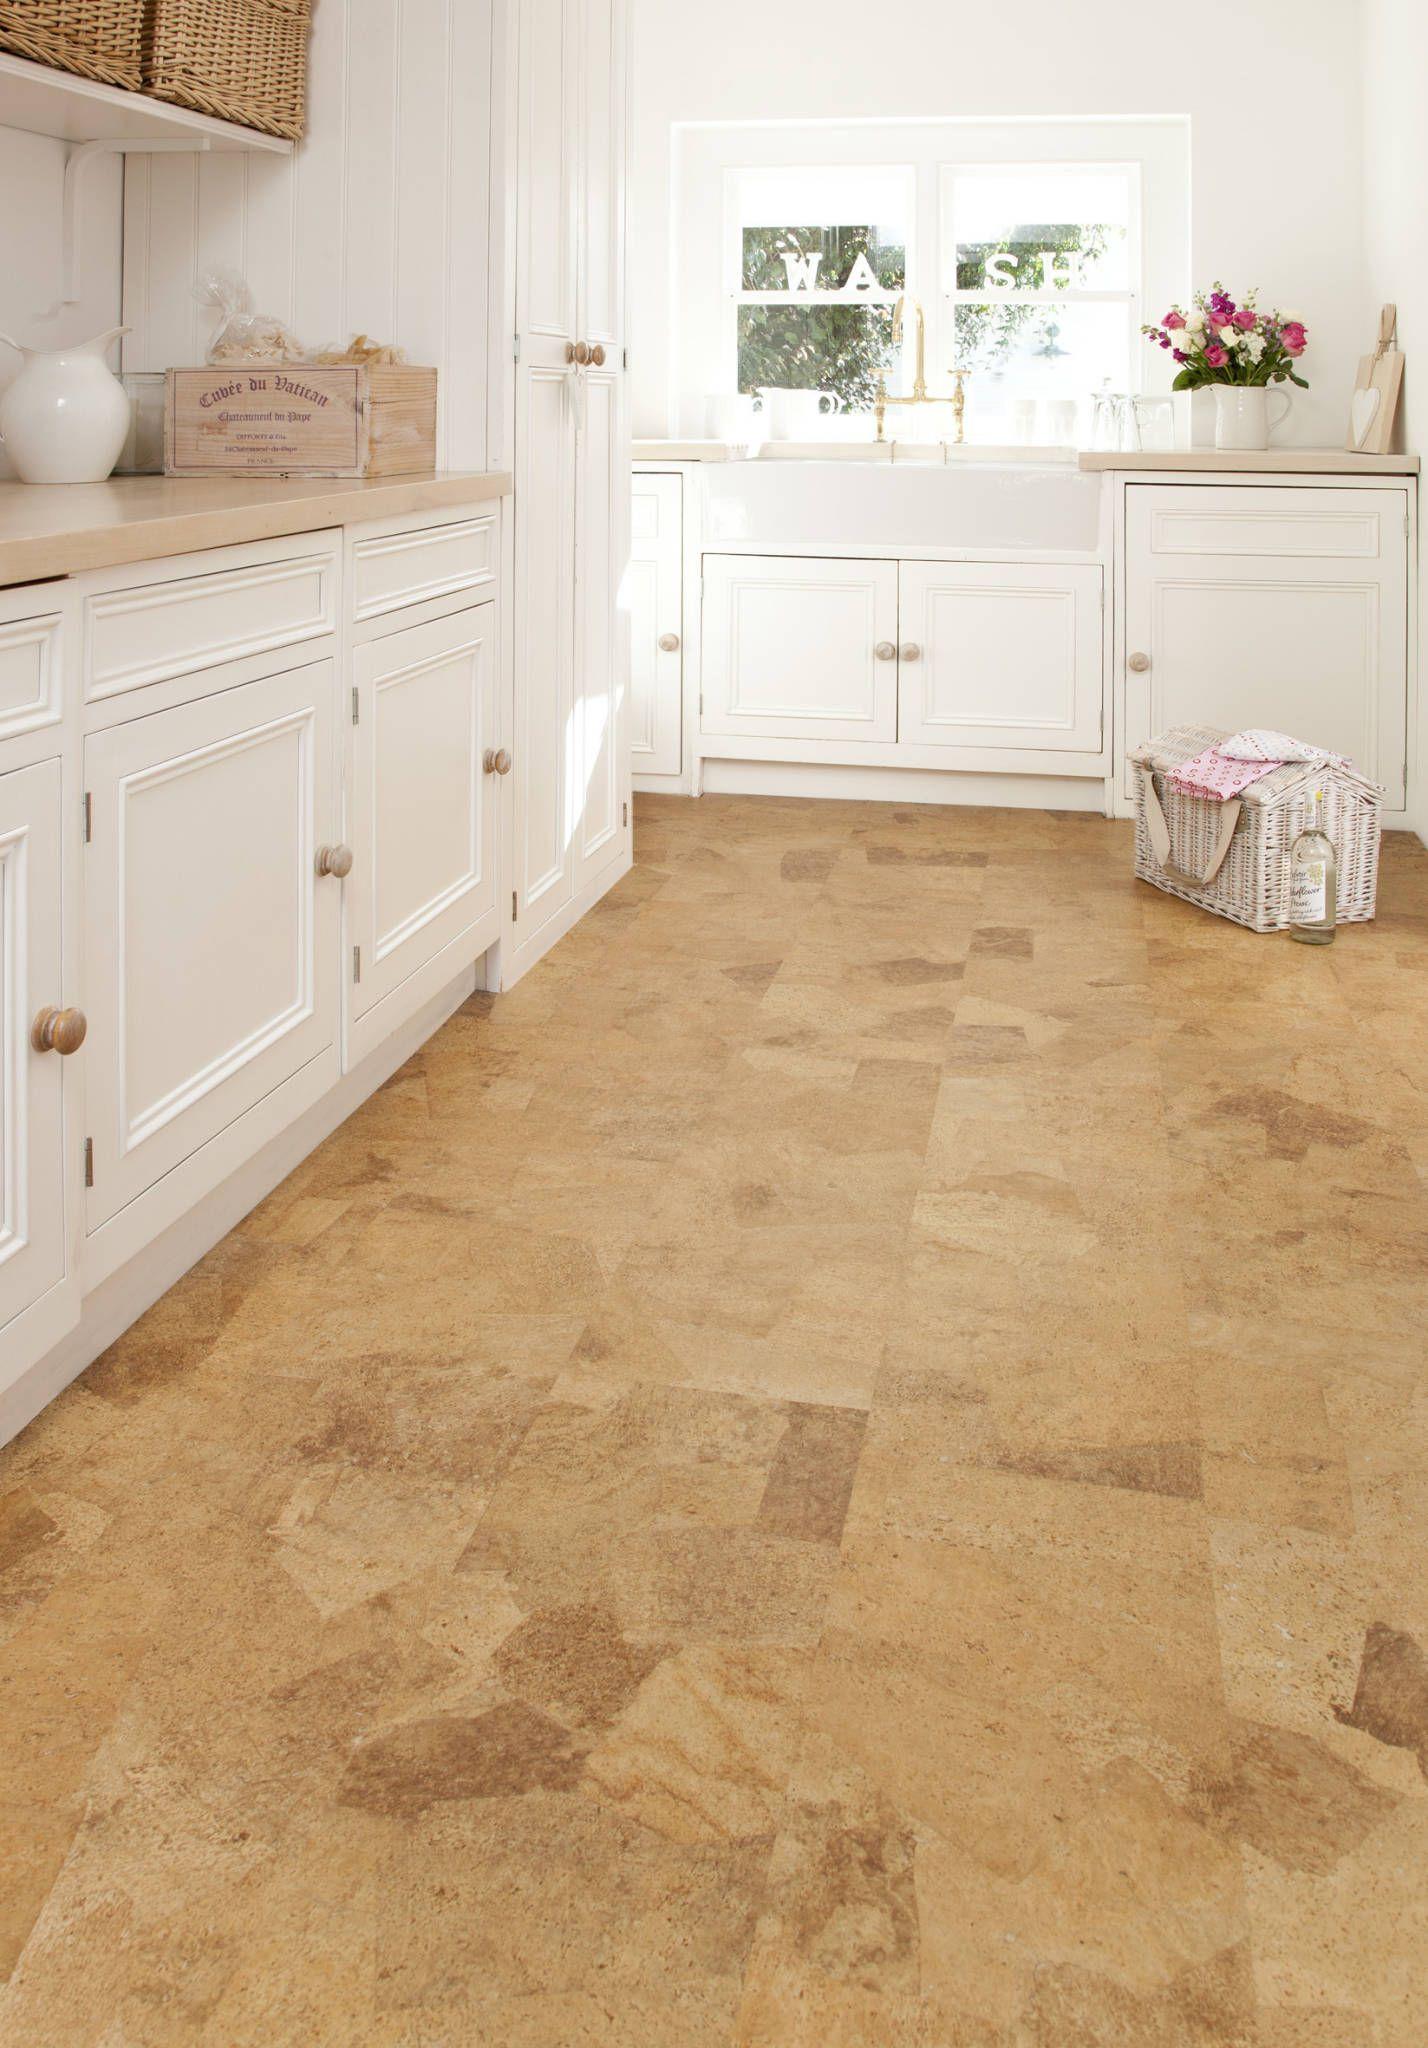 Bloom Classic By Granorte Classic Cork Flooring Kitchen Modern Kitchen Tile Floor Kitchen Floor Tile Patterns